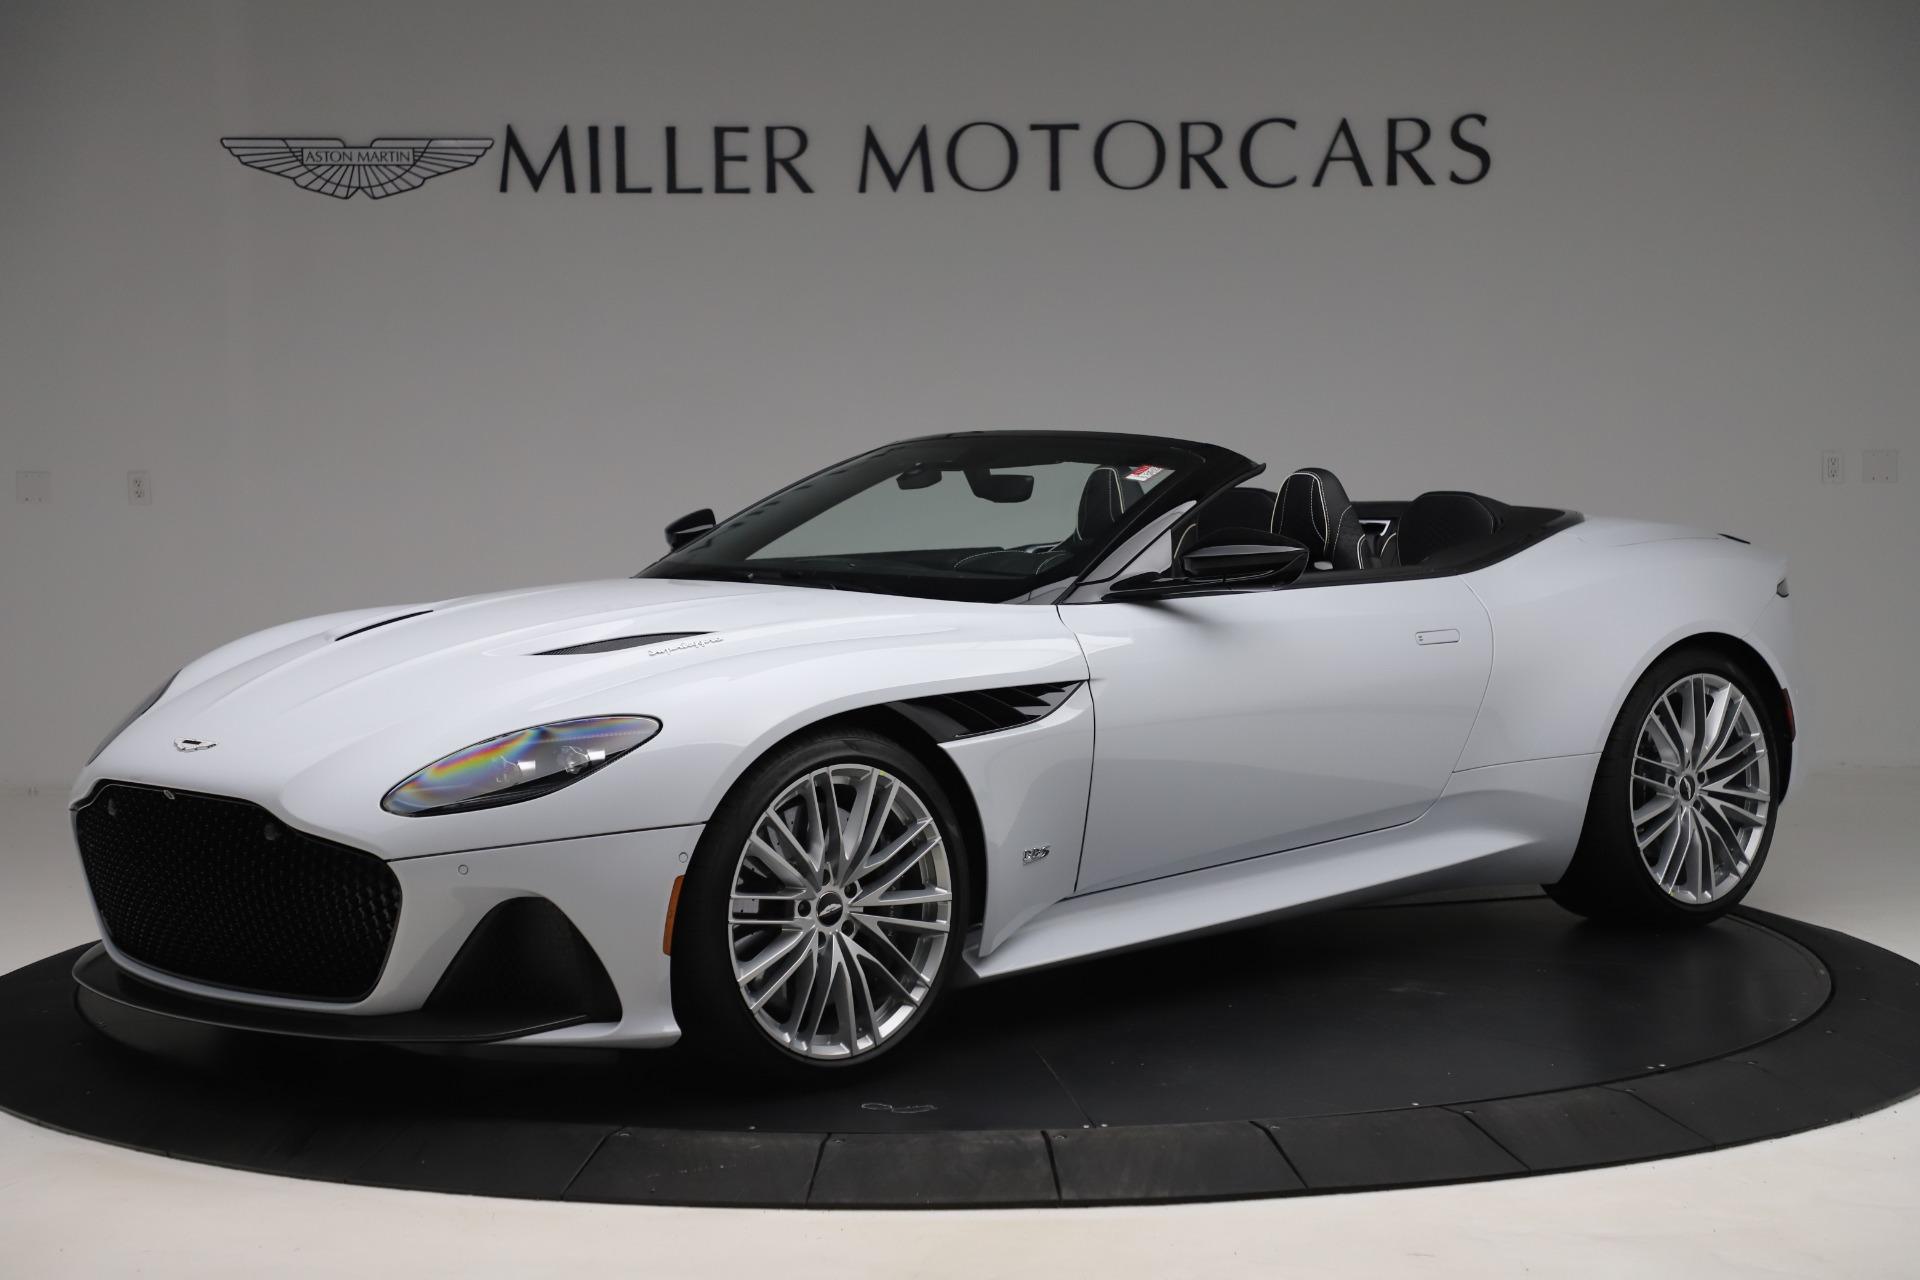 New 2020 Aston Martin DBS Superleggera Volante Convertible for sale $353,931 at Rolls-Royce Motor Cars Greenwich in Greenwich CT 06830 1